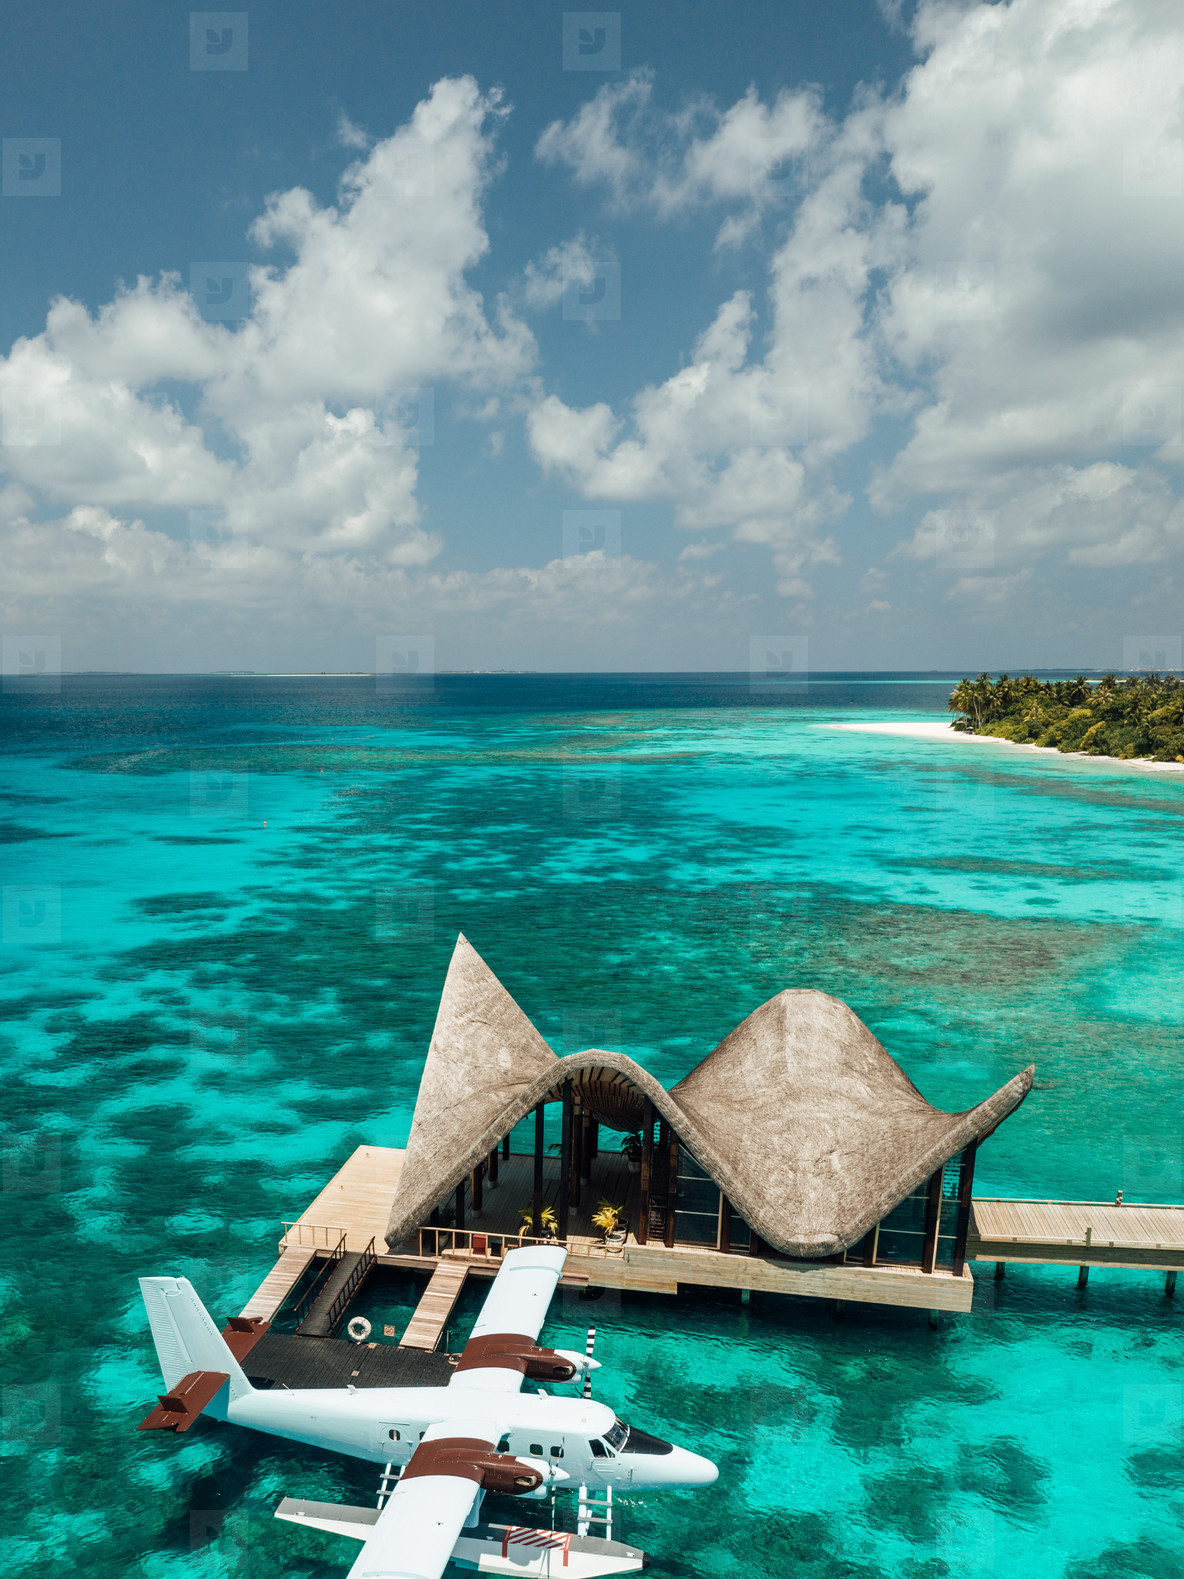 Luxury tourist destination on a tropical island